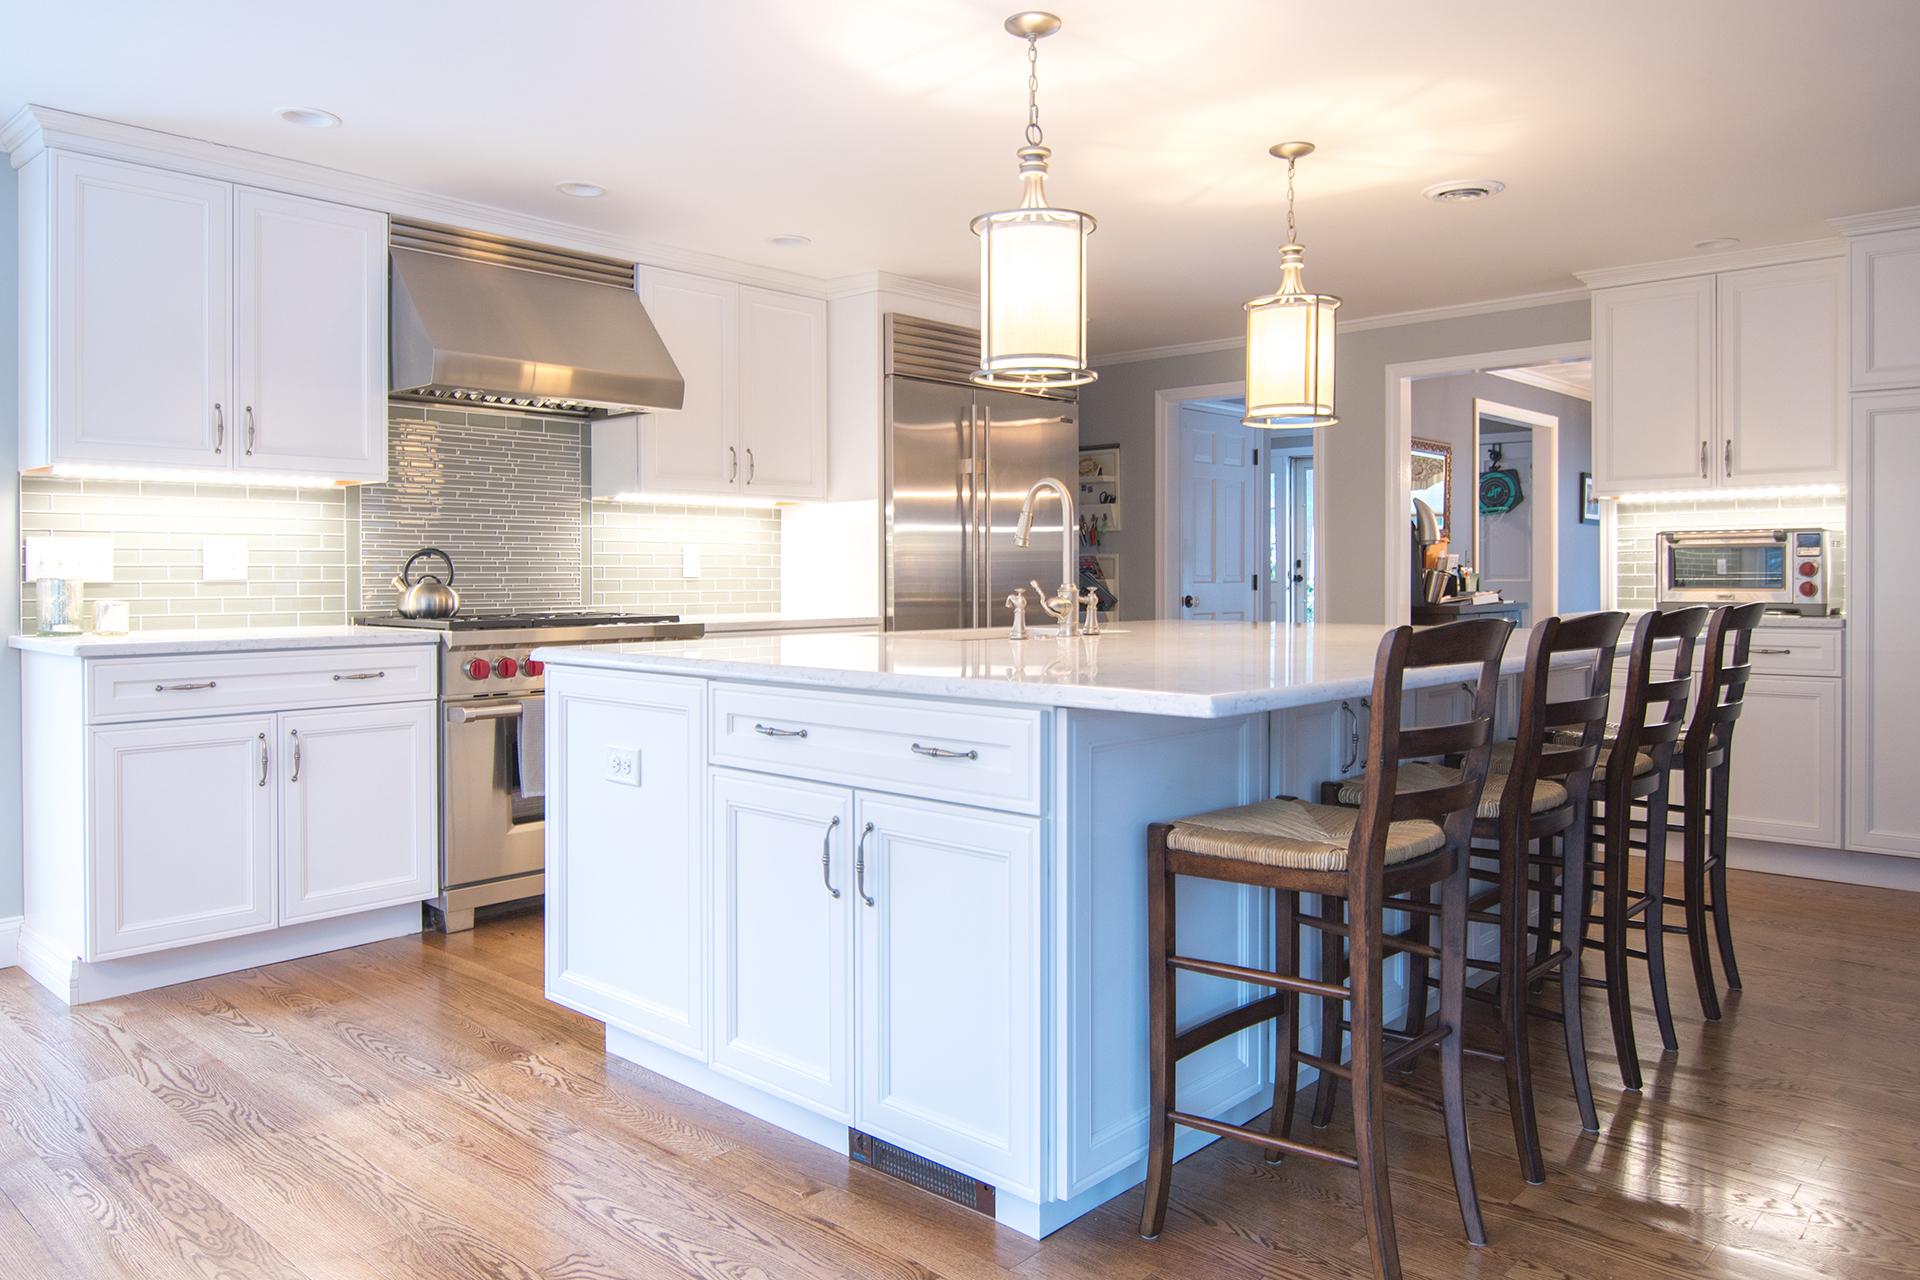 nice lighting in new kitchen